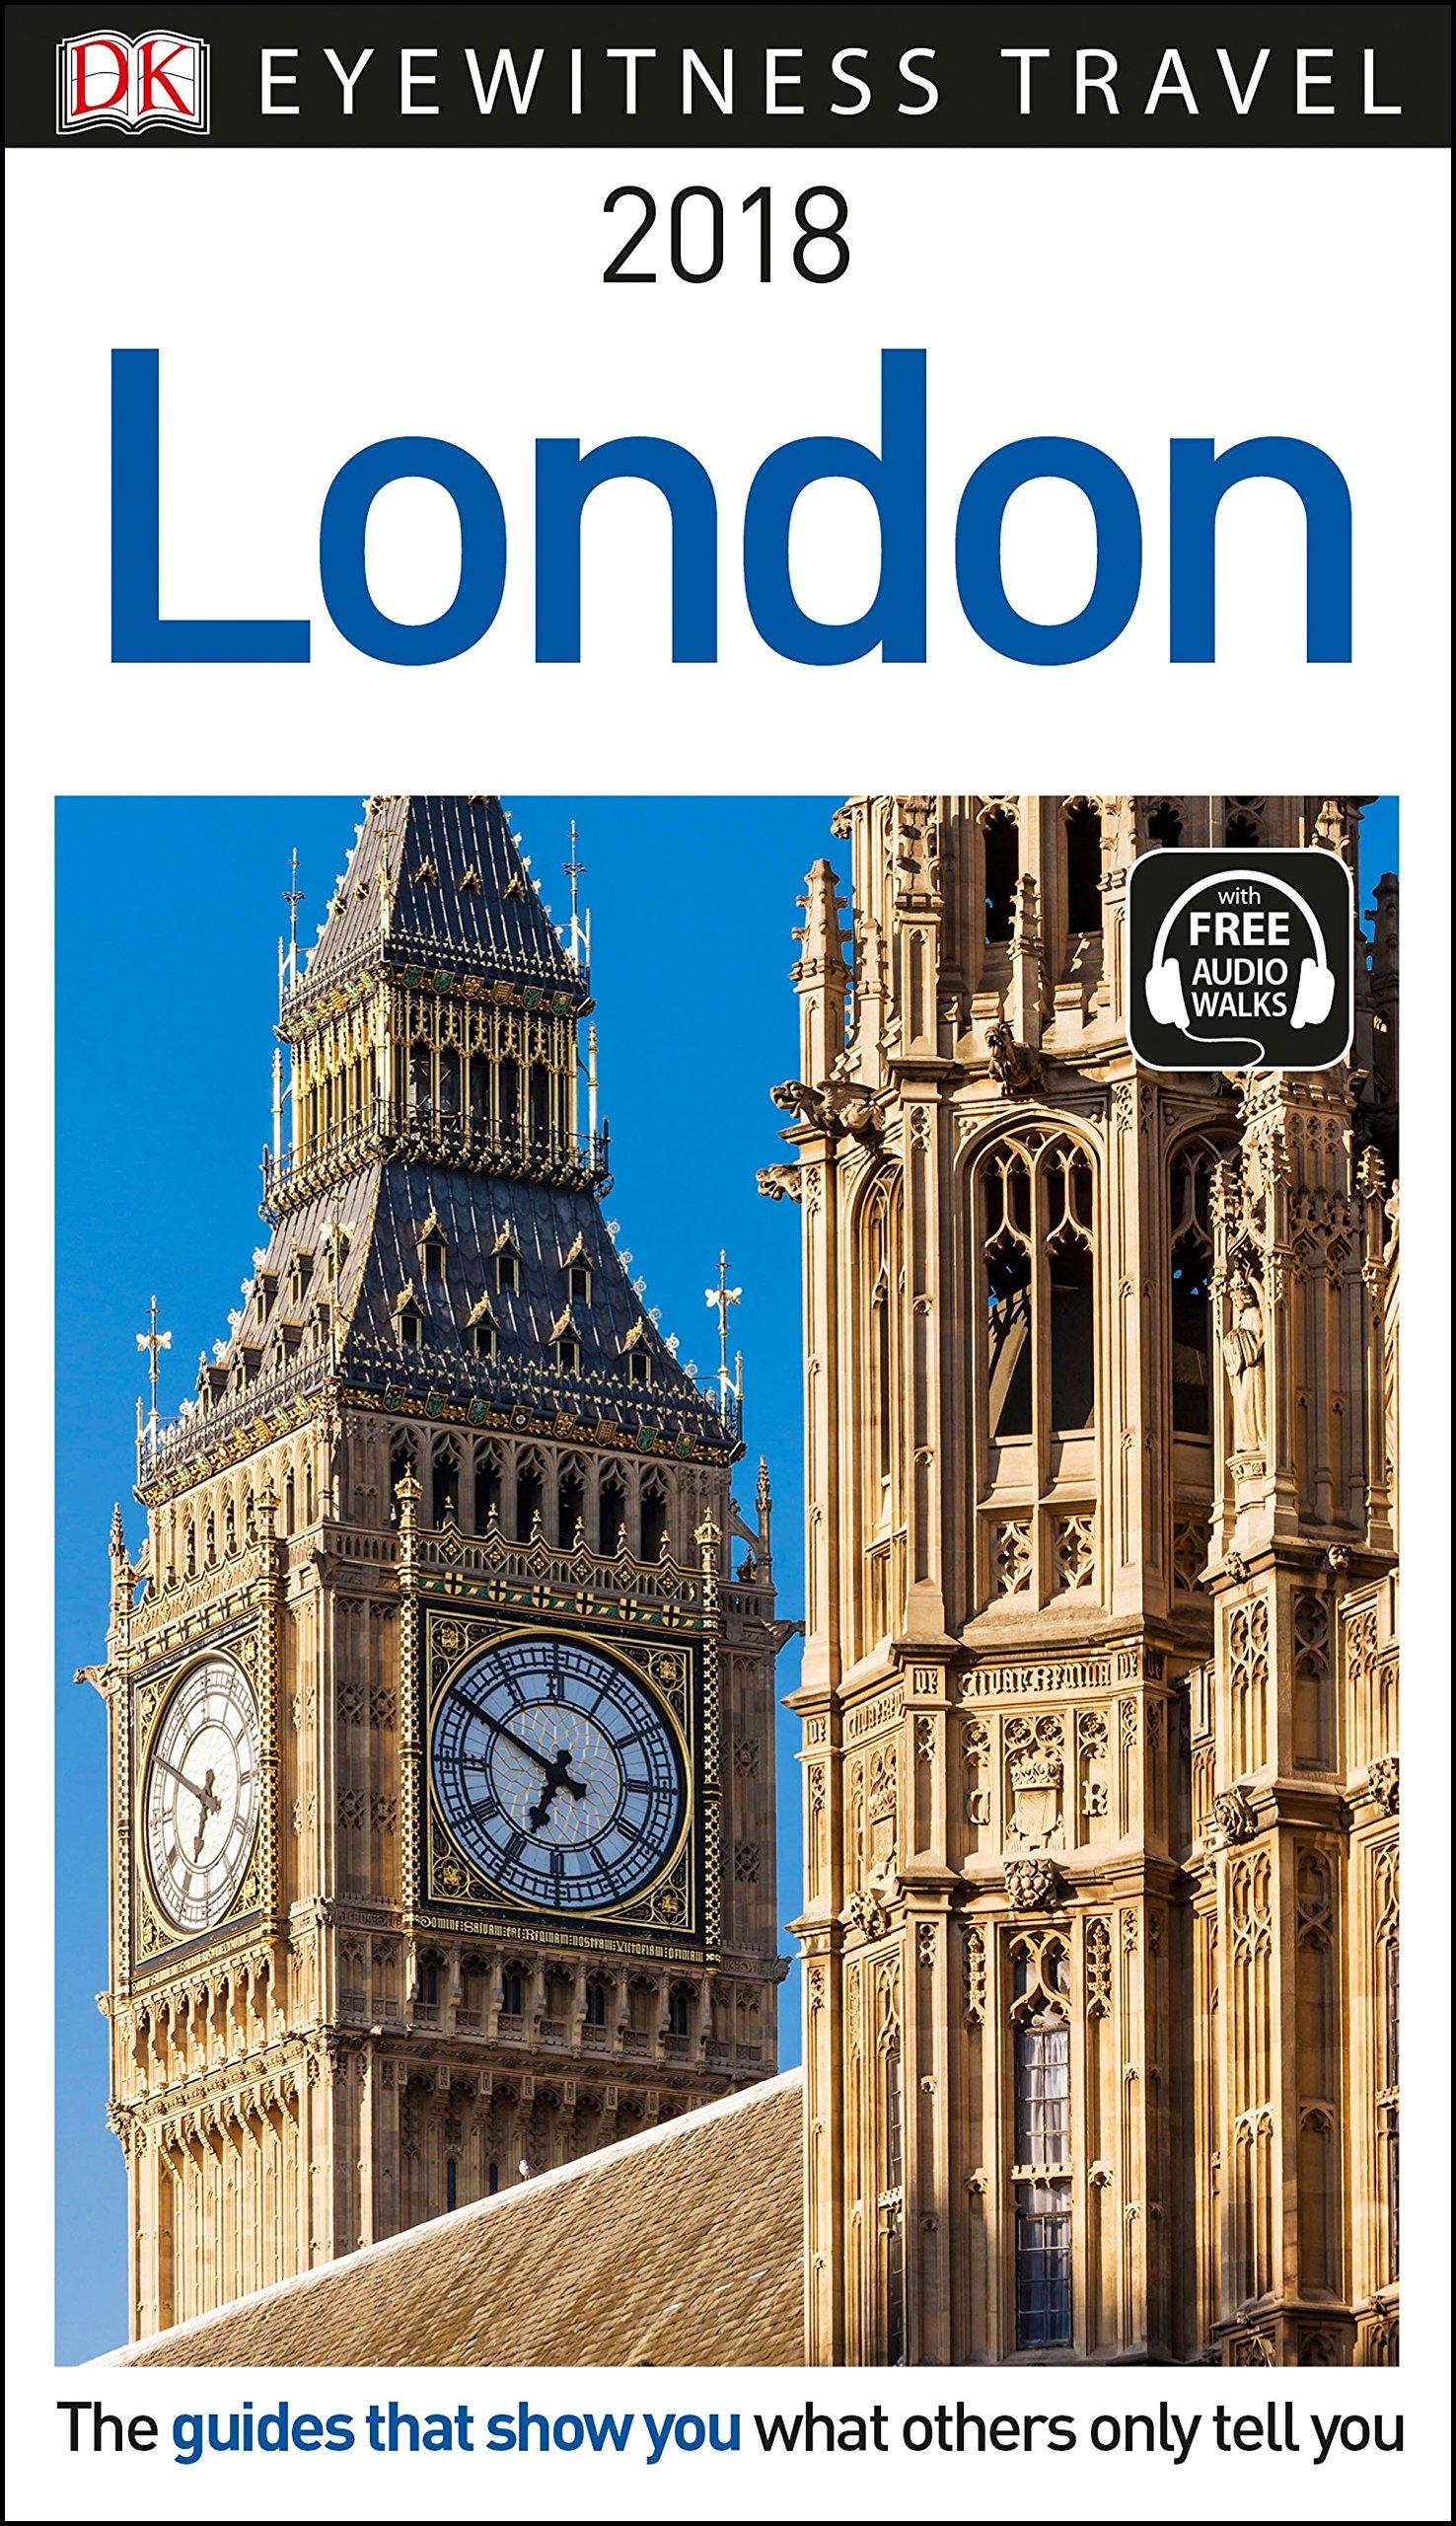 dk eyewitness travel guide london dk travel 9781465460448 amazon rh amazon com dk eyewitness travel guide london 2018 dk eyewitness travel guide london 2018